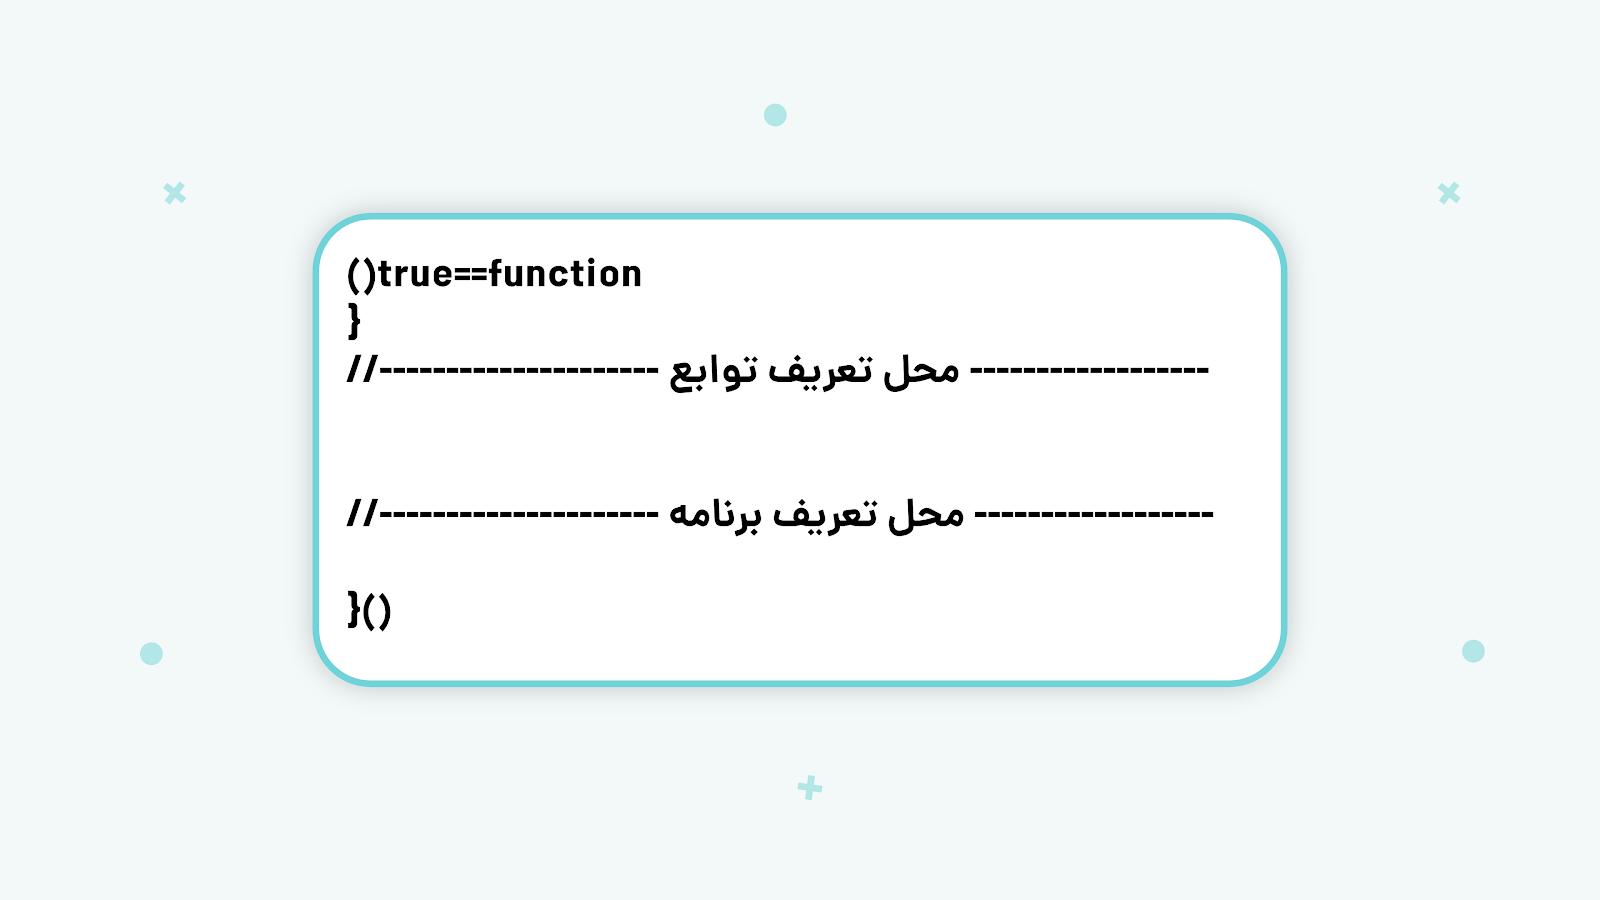 قالب کدنویسی در فیلتر نویسی